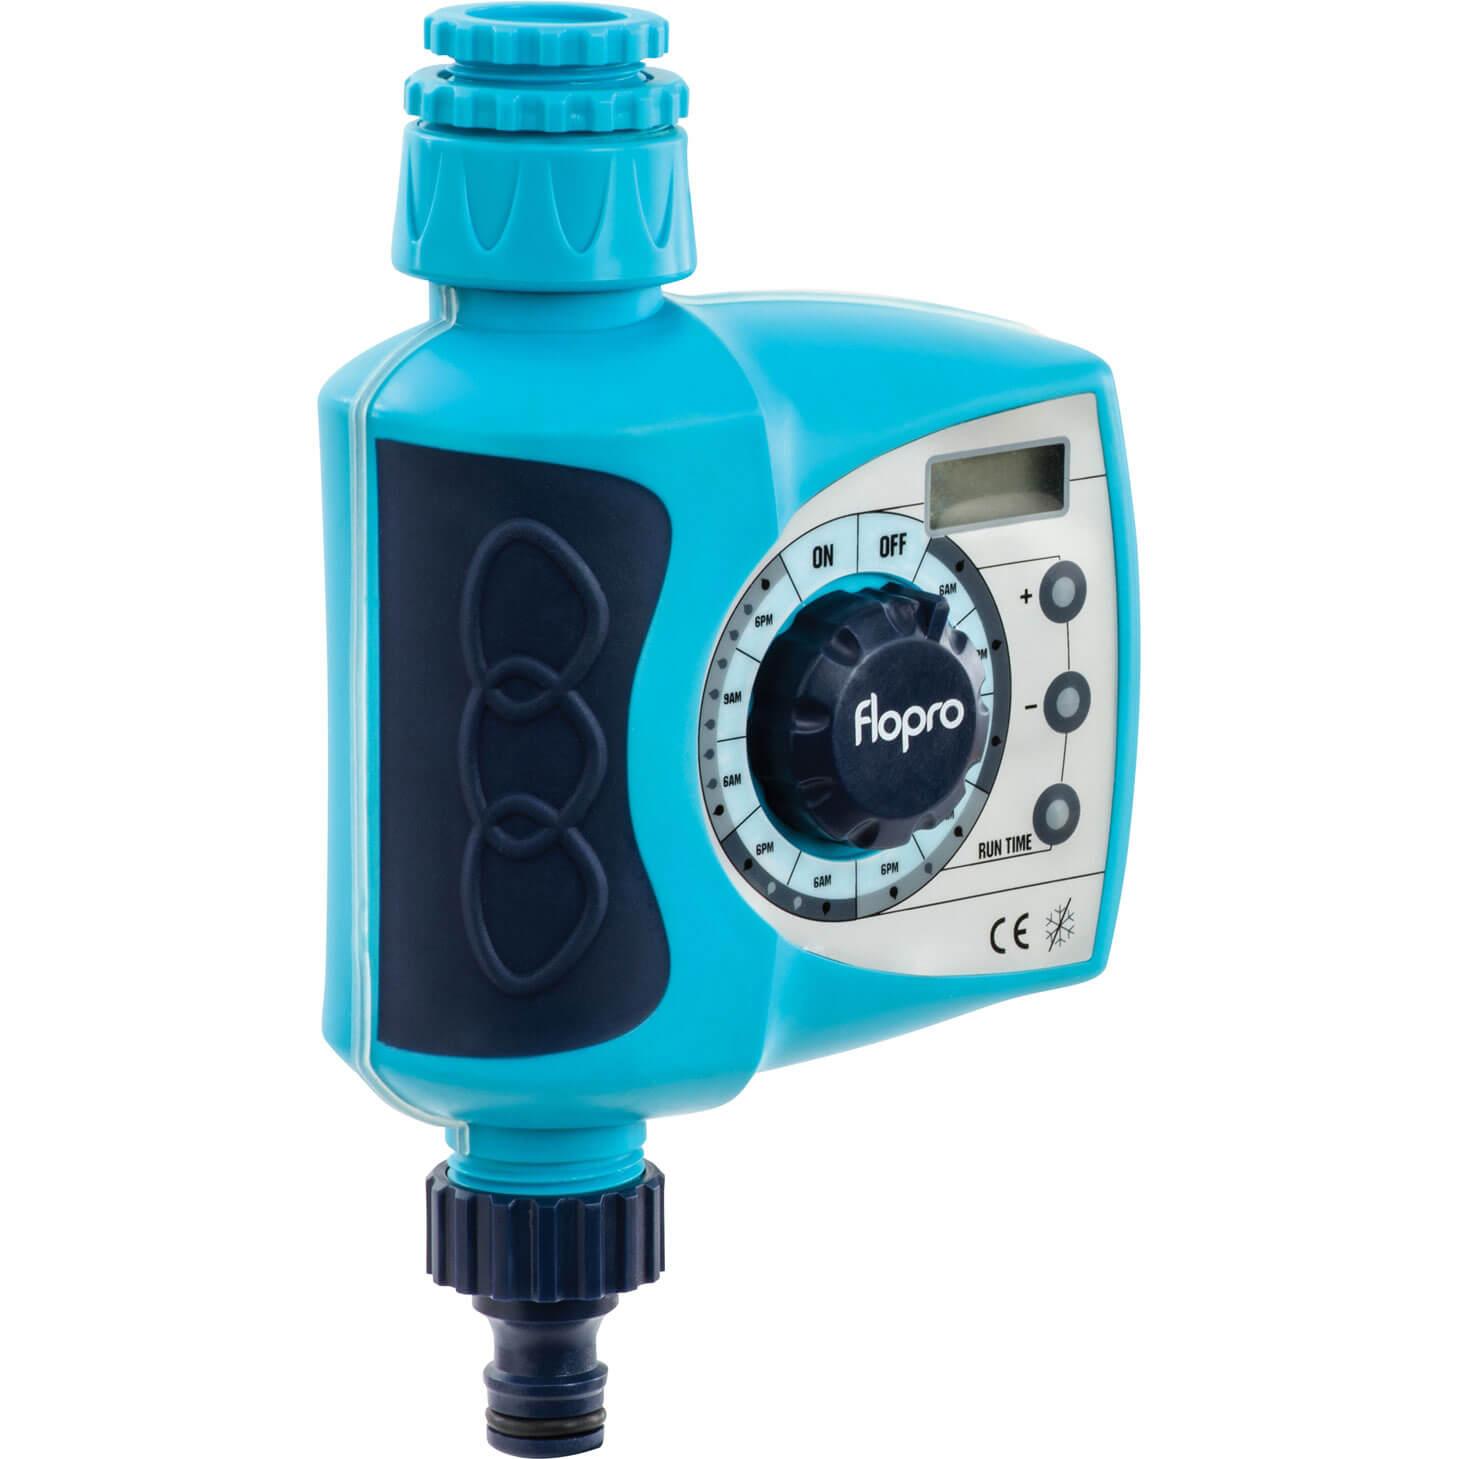 Image of Flopro Digital Garden Water Timer